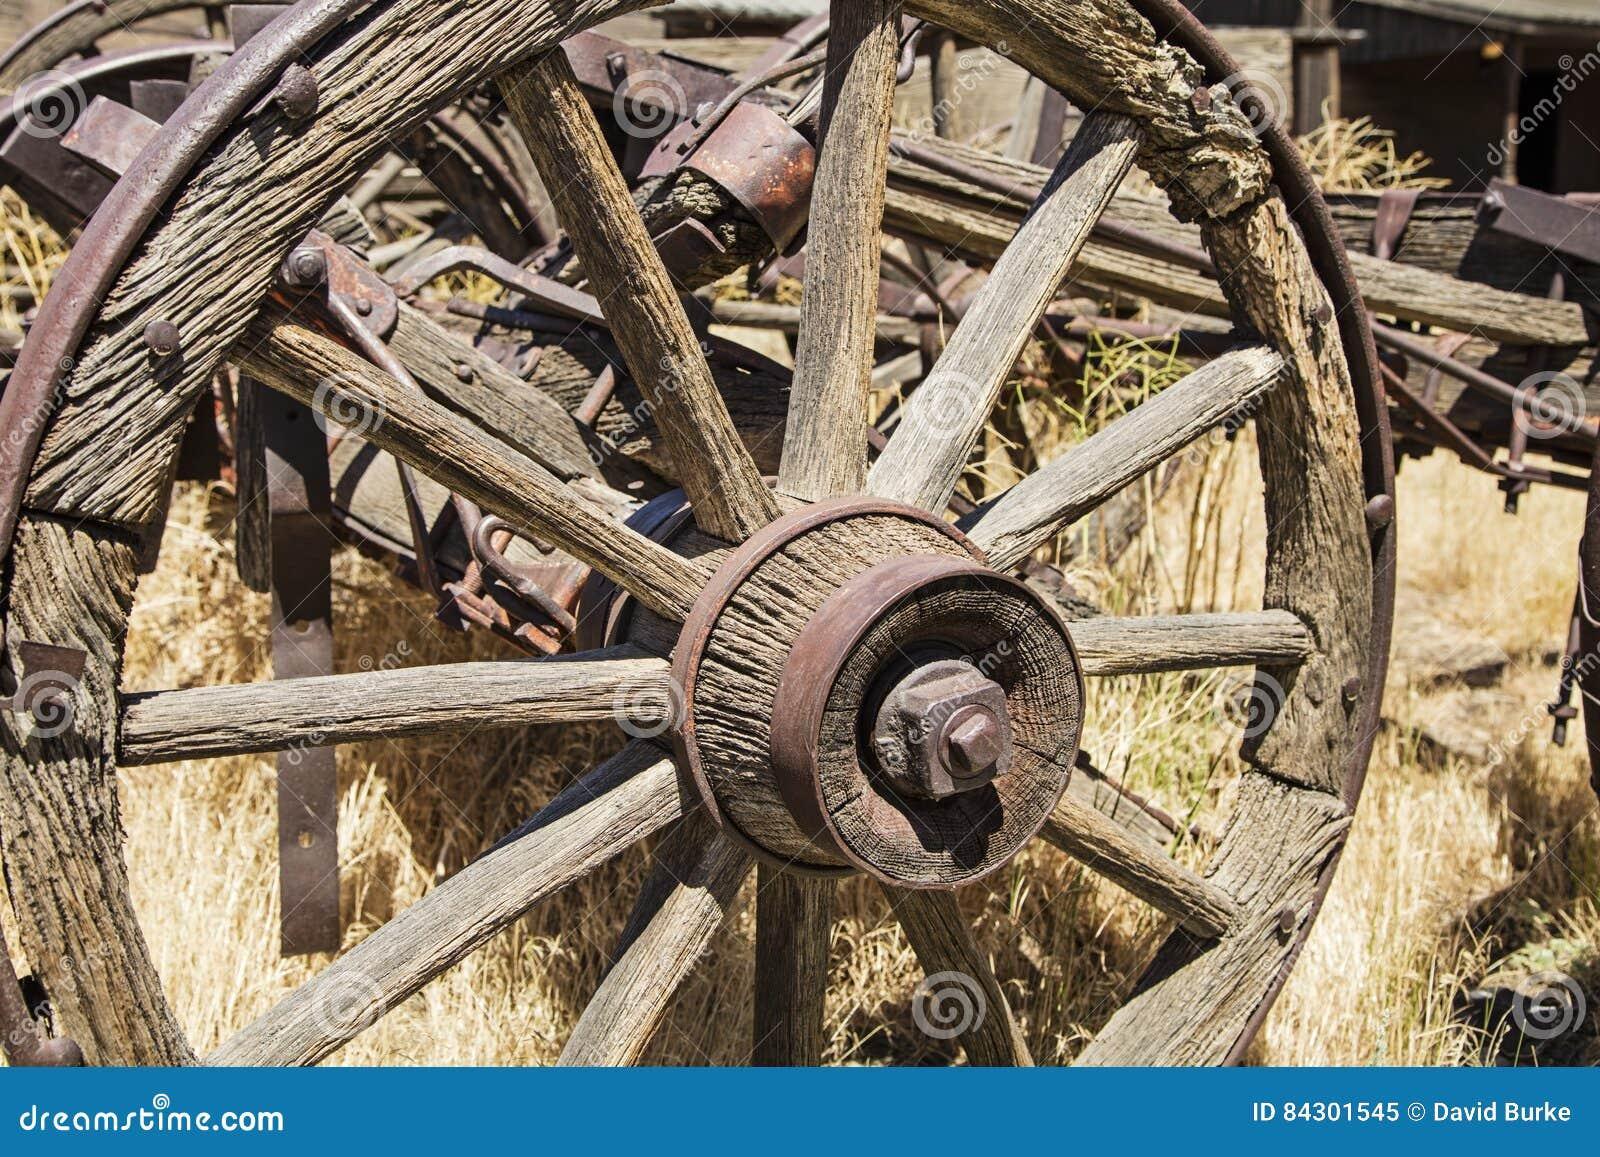 Wooden Wagon Wheel Axle Weathered Stock Image Image Of Nature Rustic 84301545